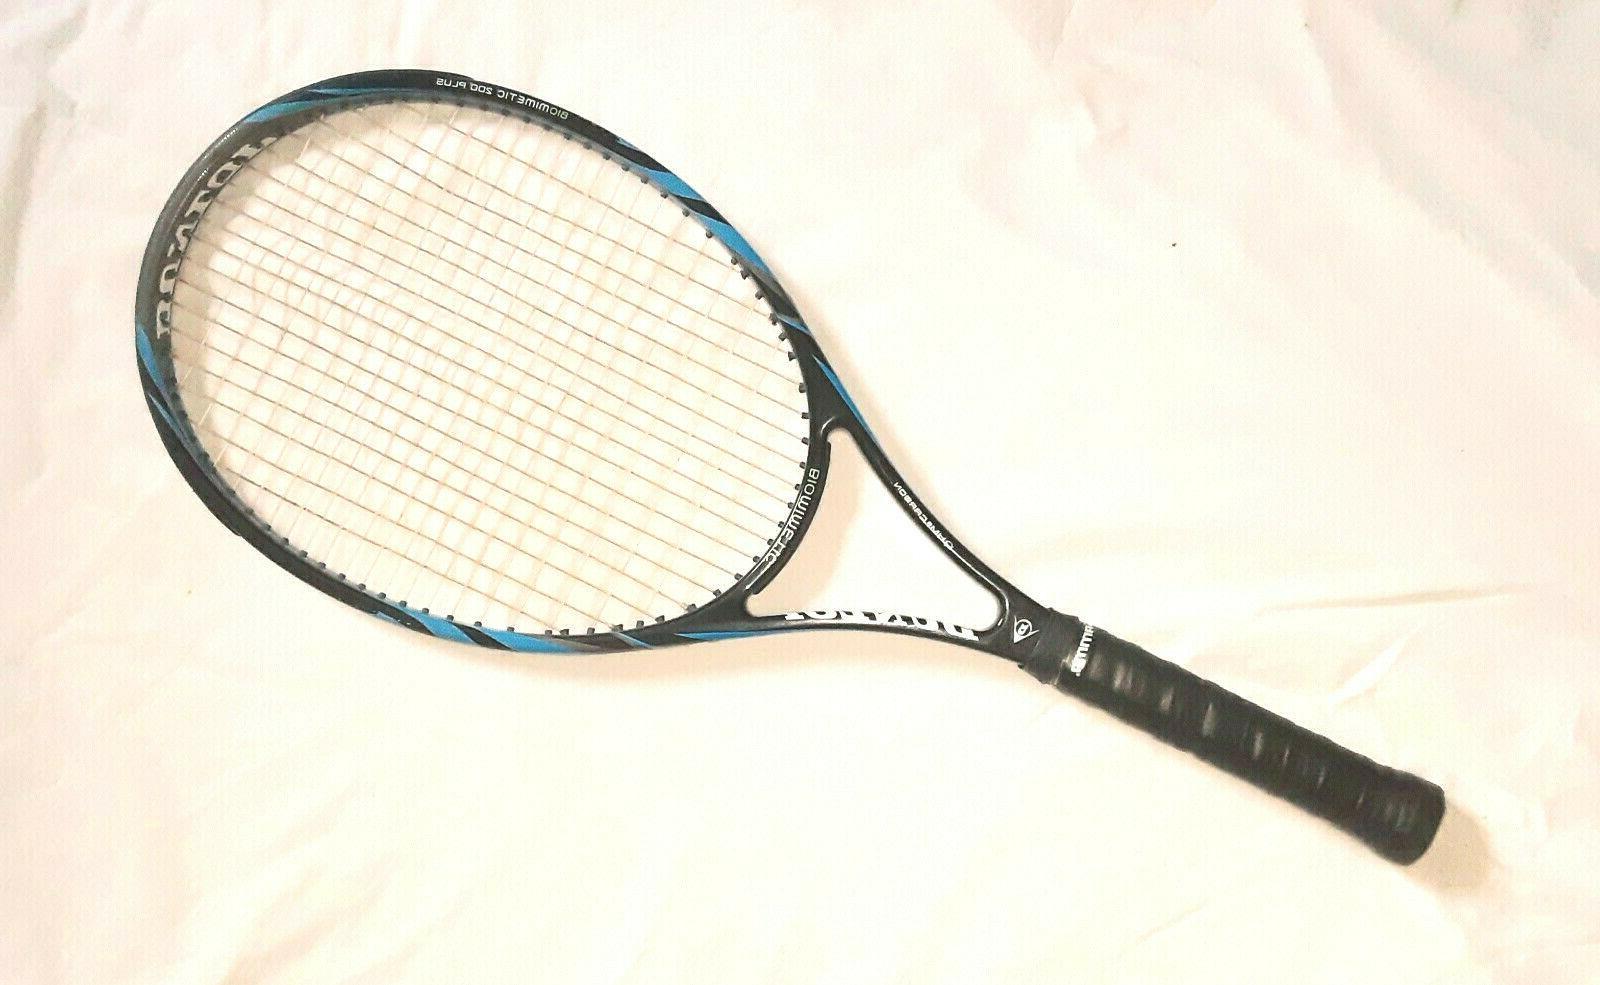 biomimetic 200 4 3 8 tennis racquet